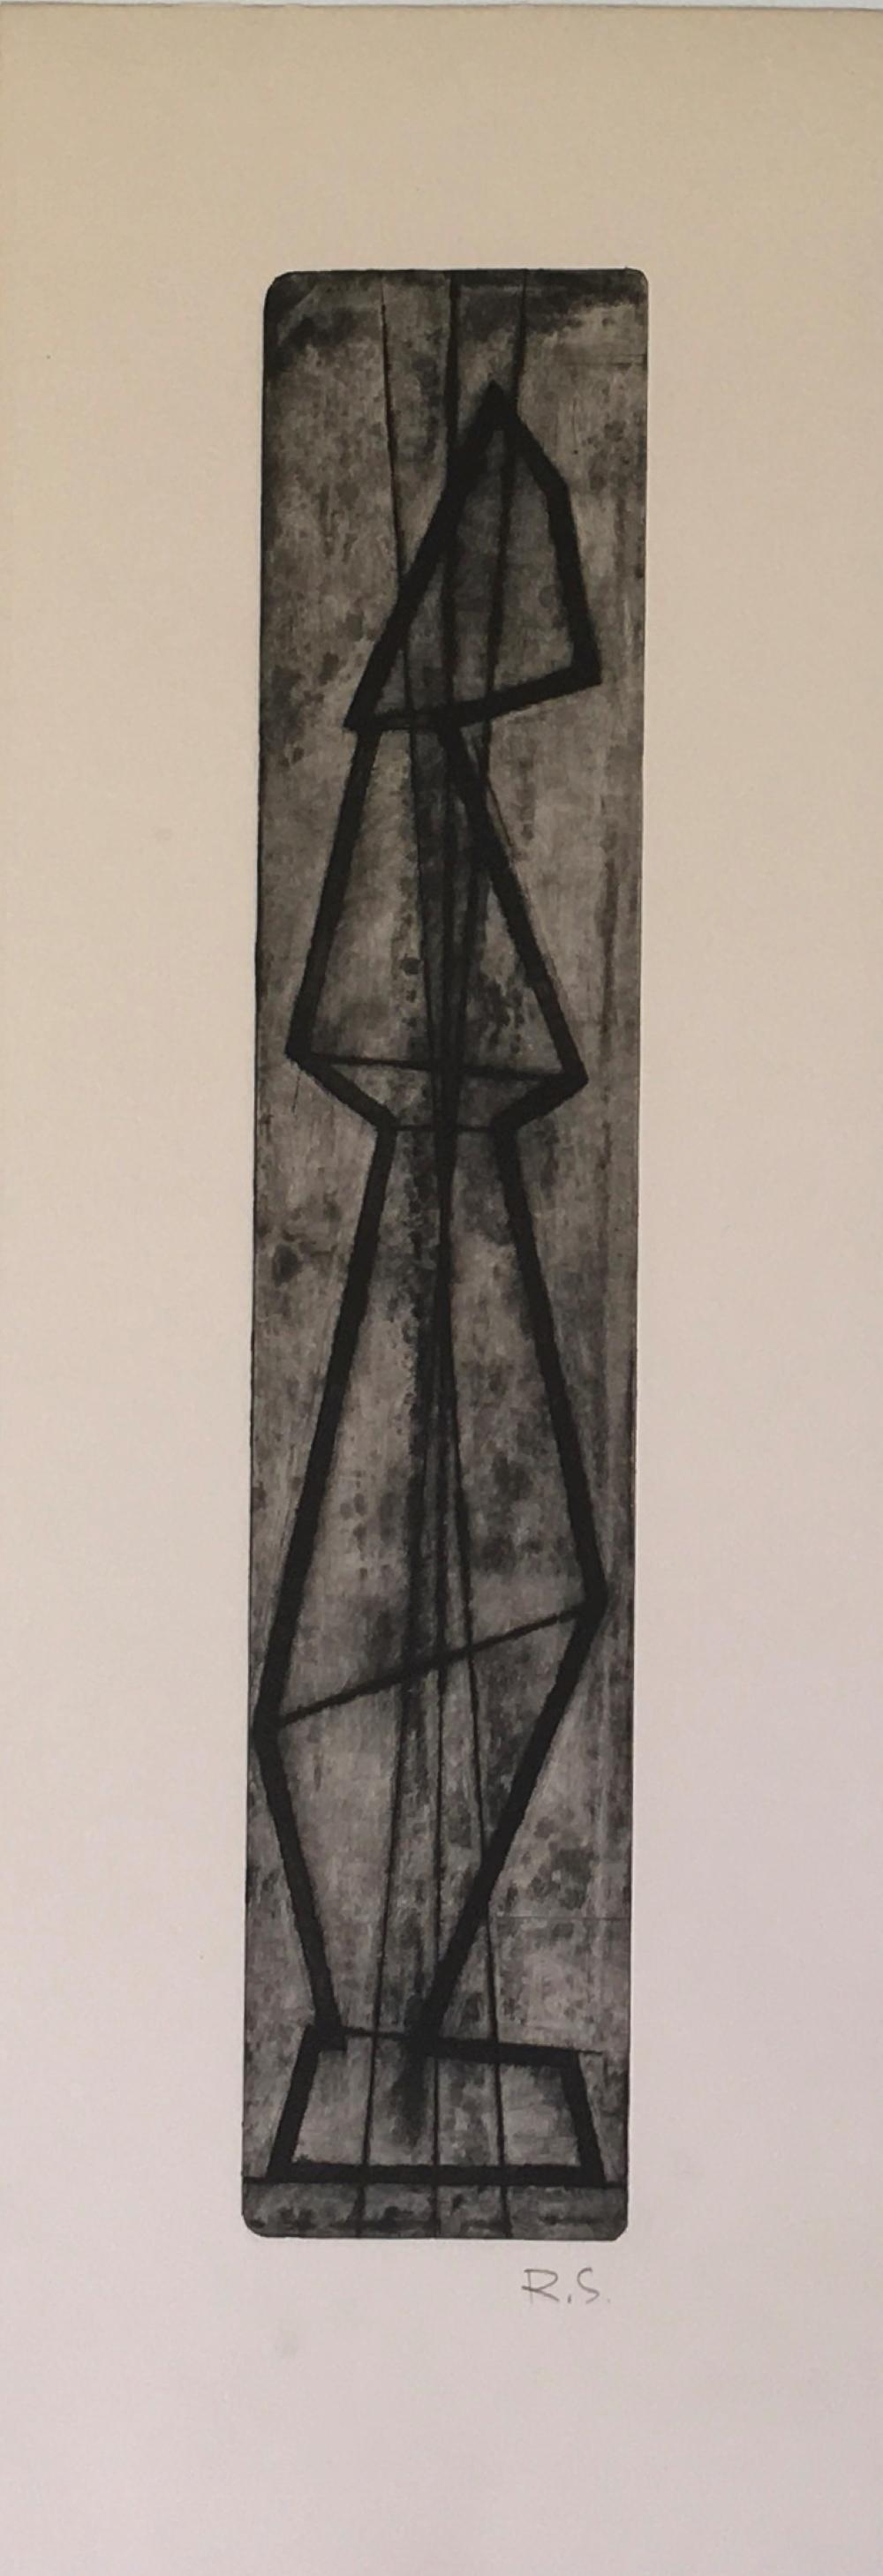 Sommaruga Renzo - Ricordo d'Oriente, 1955